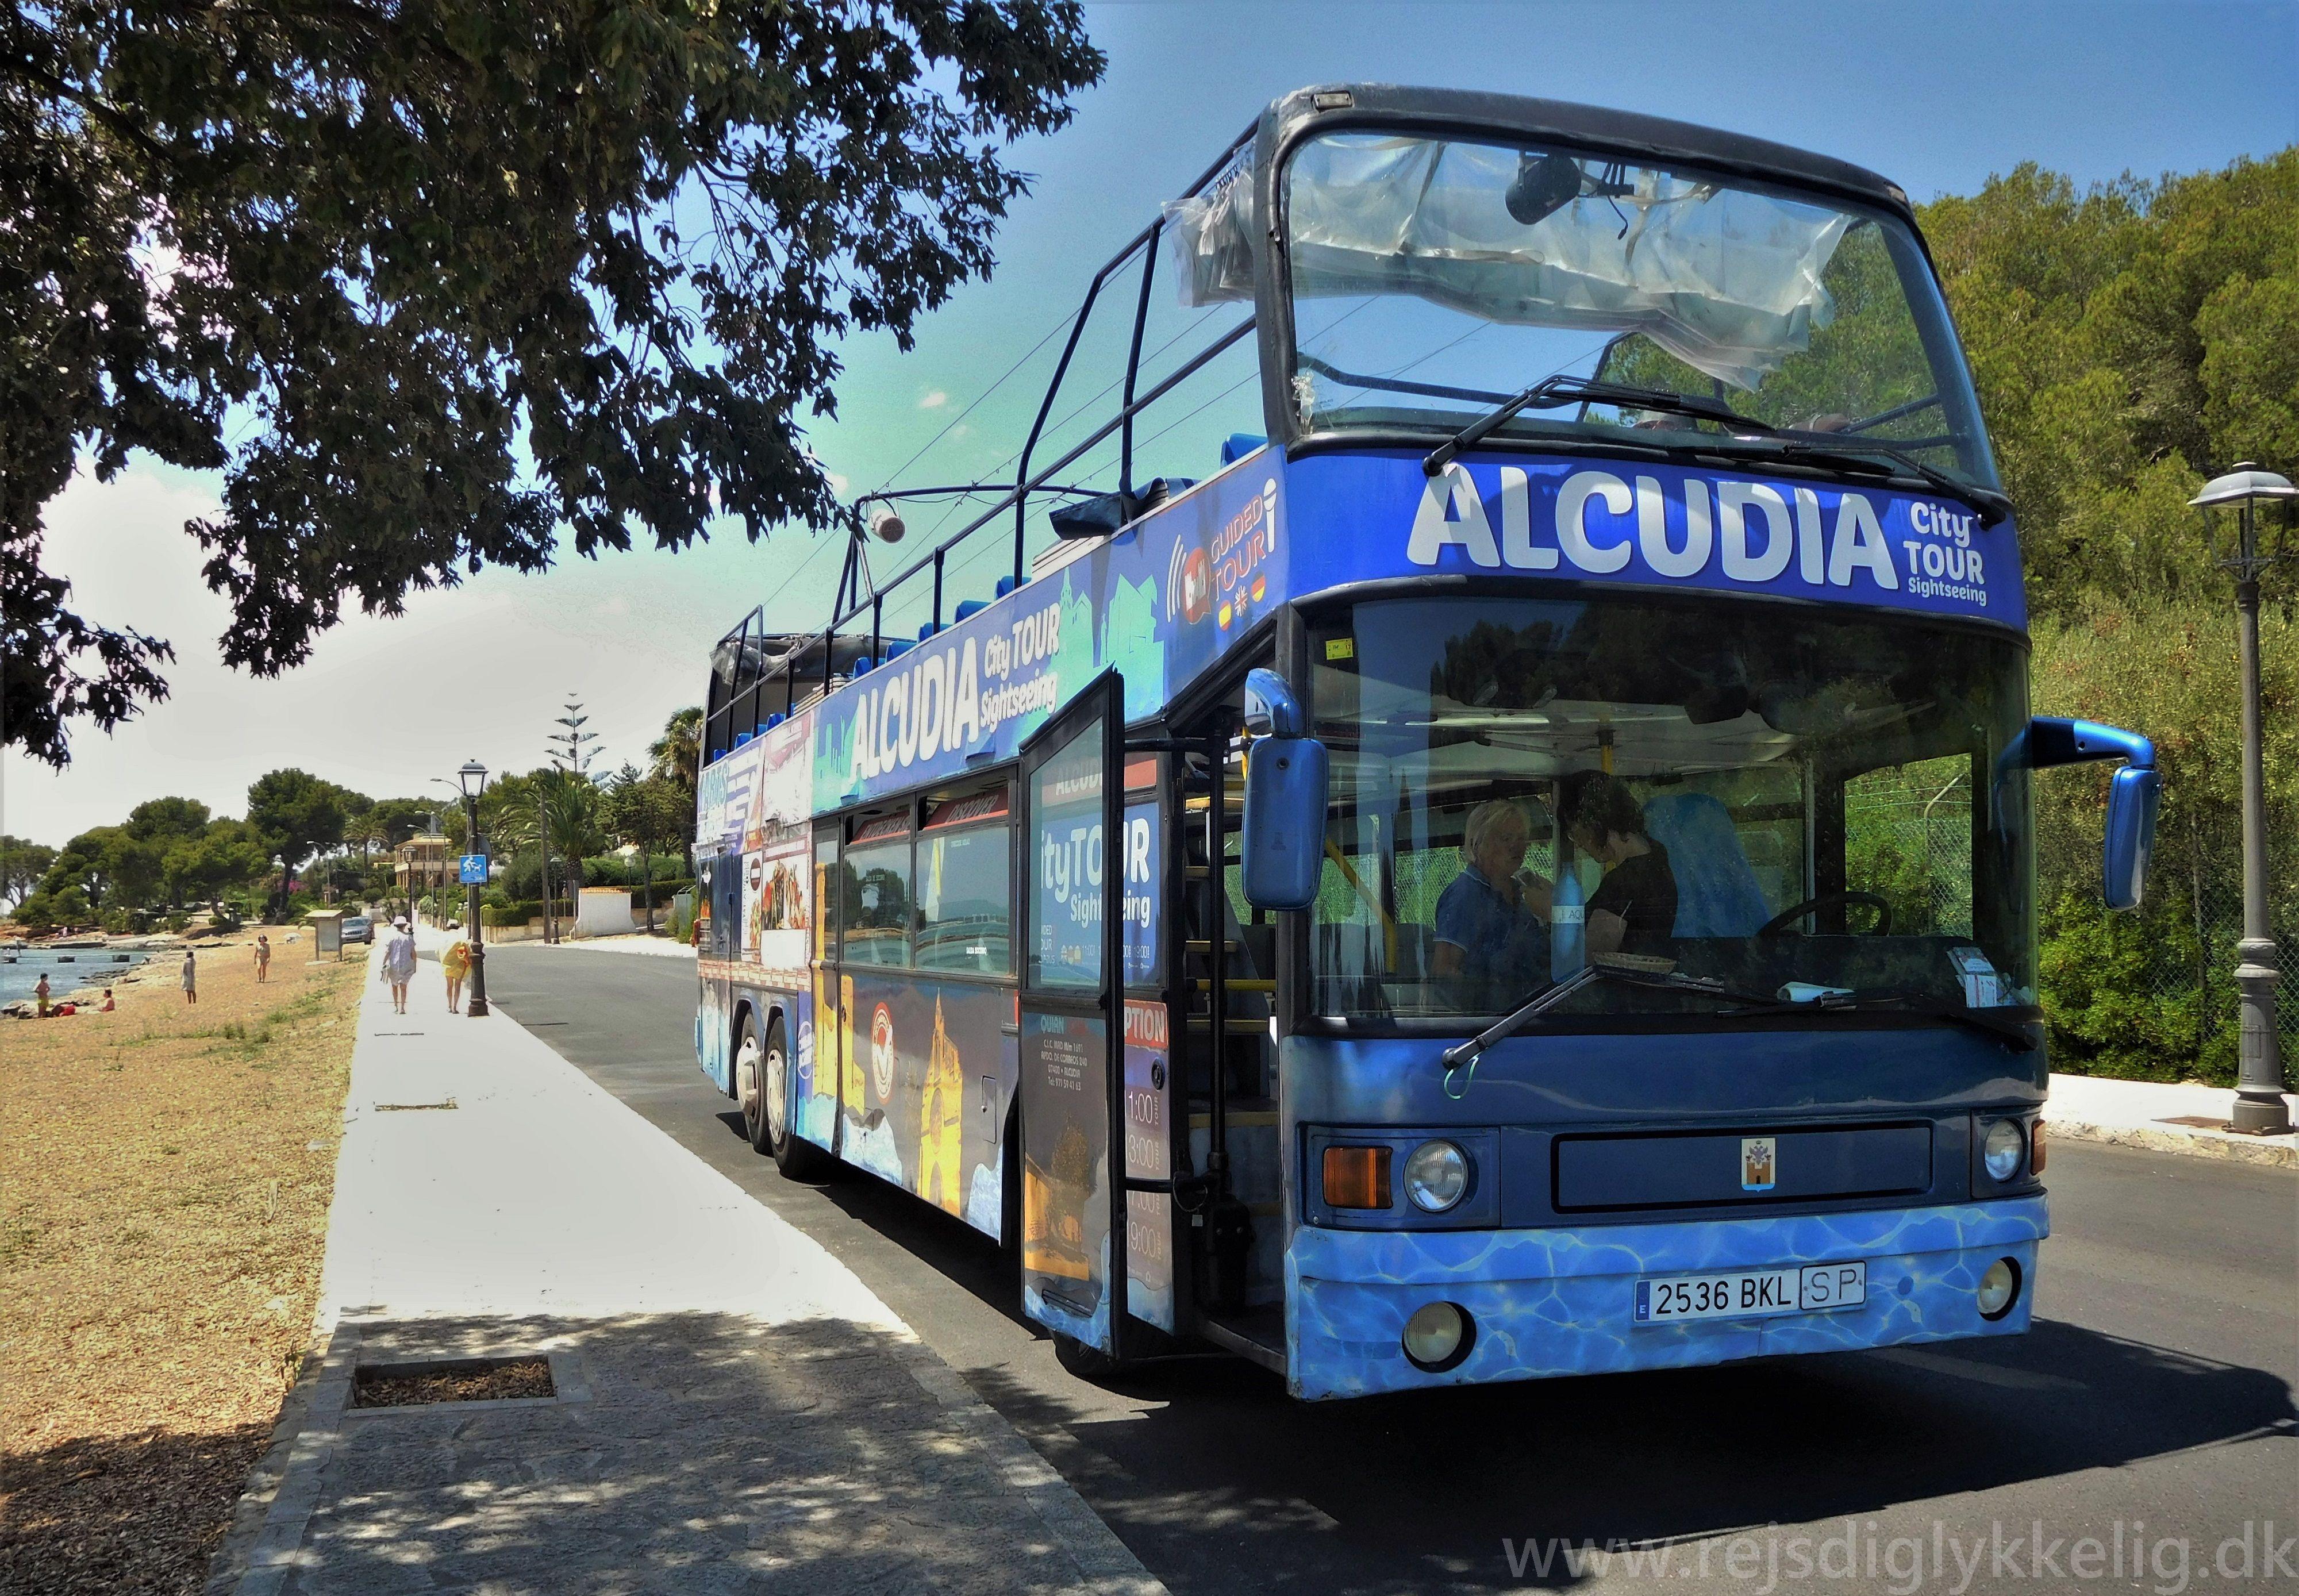 Sightseeing i Alcudia - Rejsdiglykkelig.dk